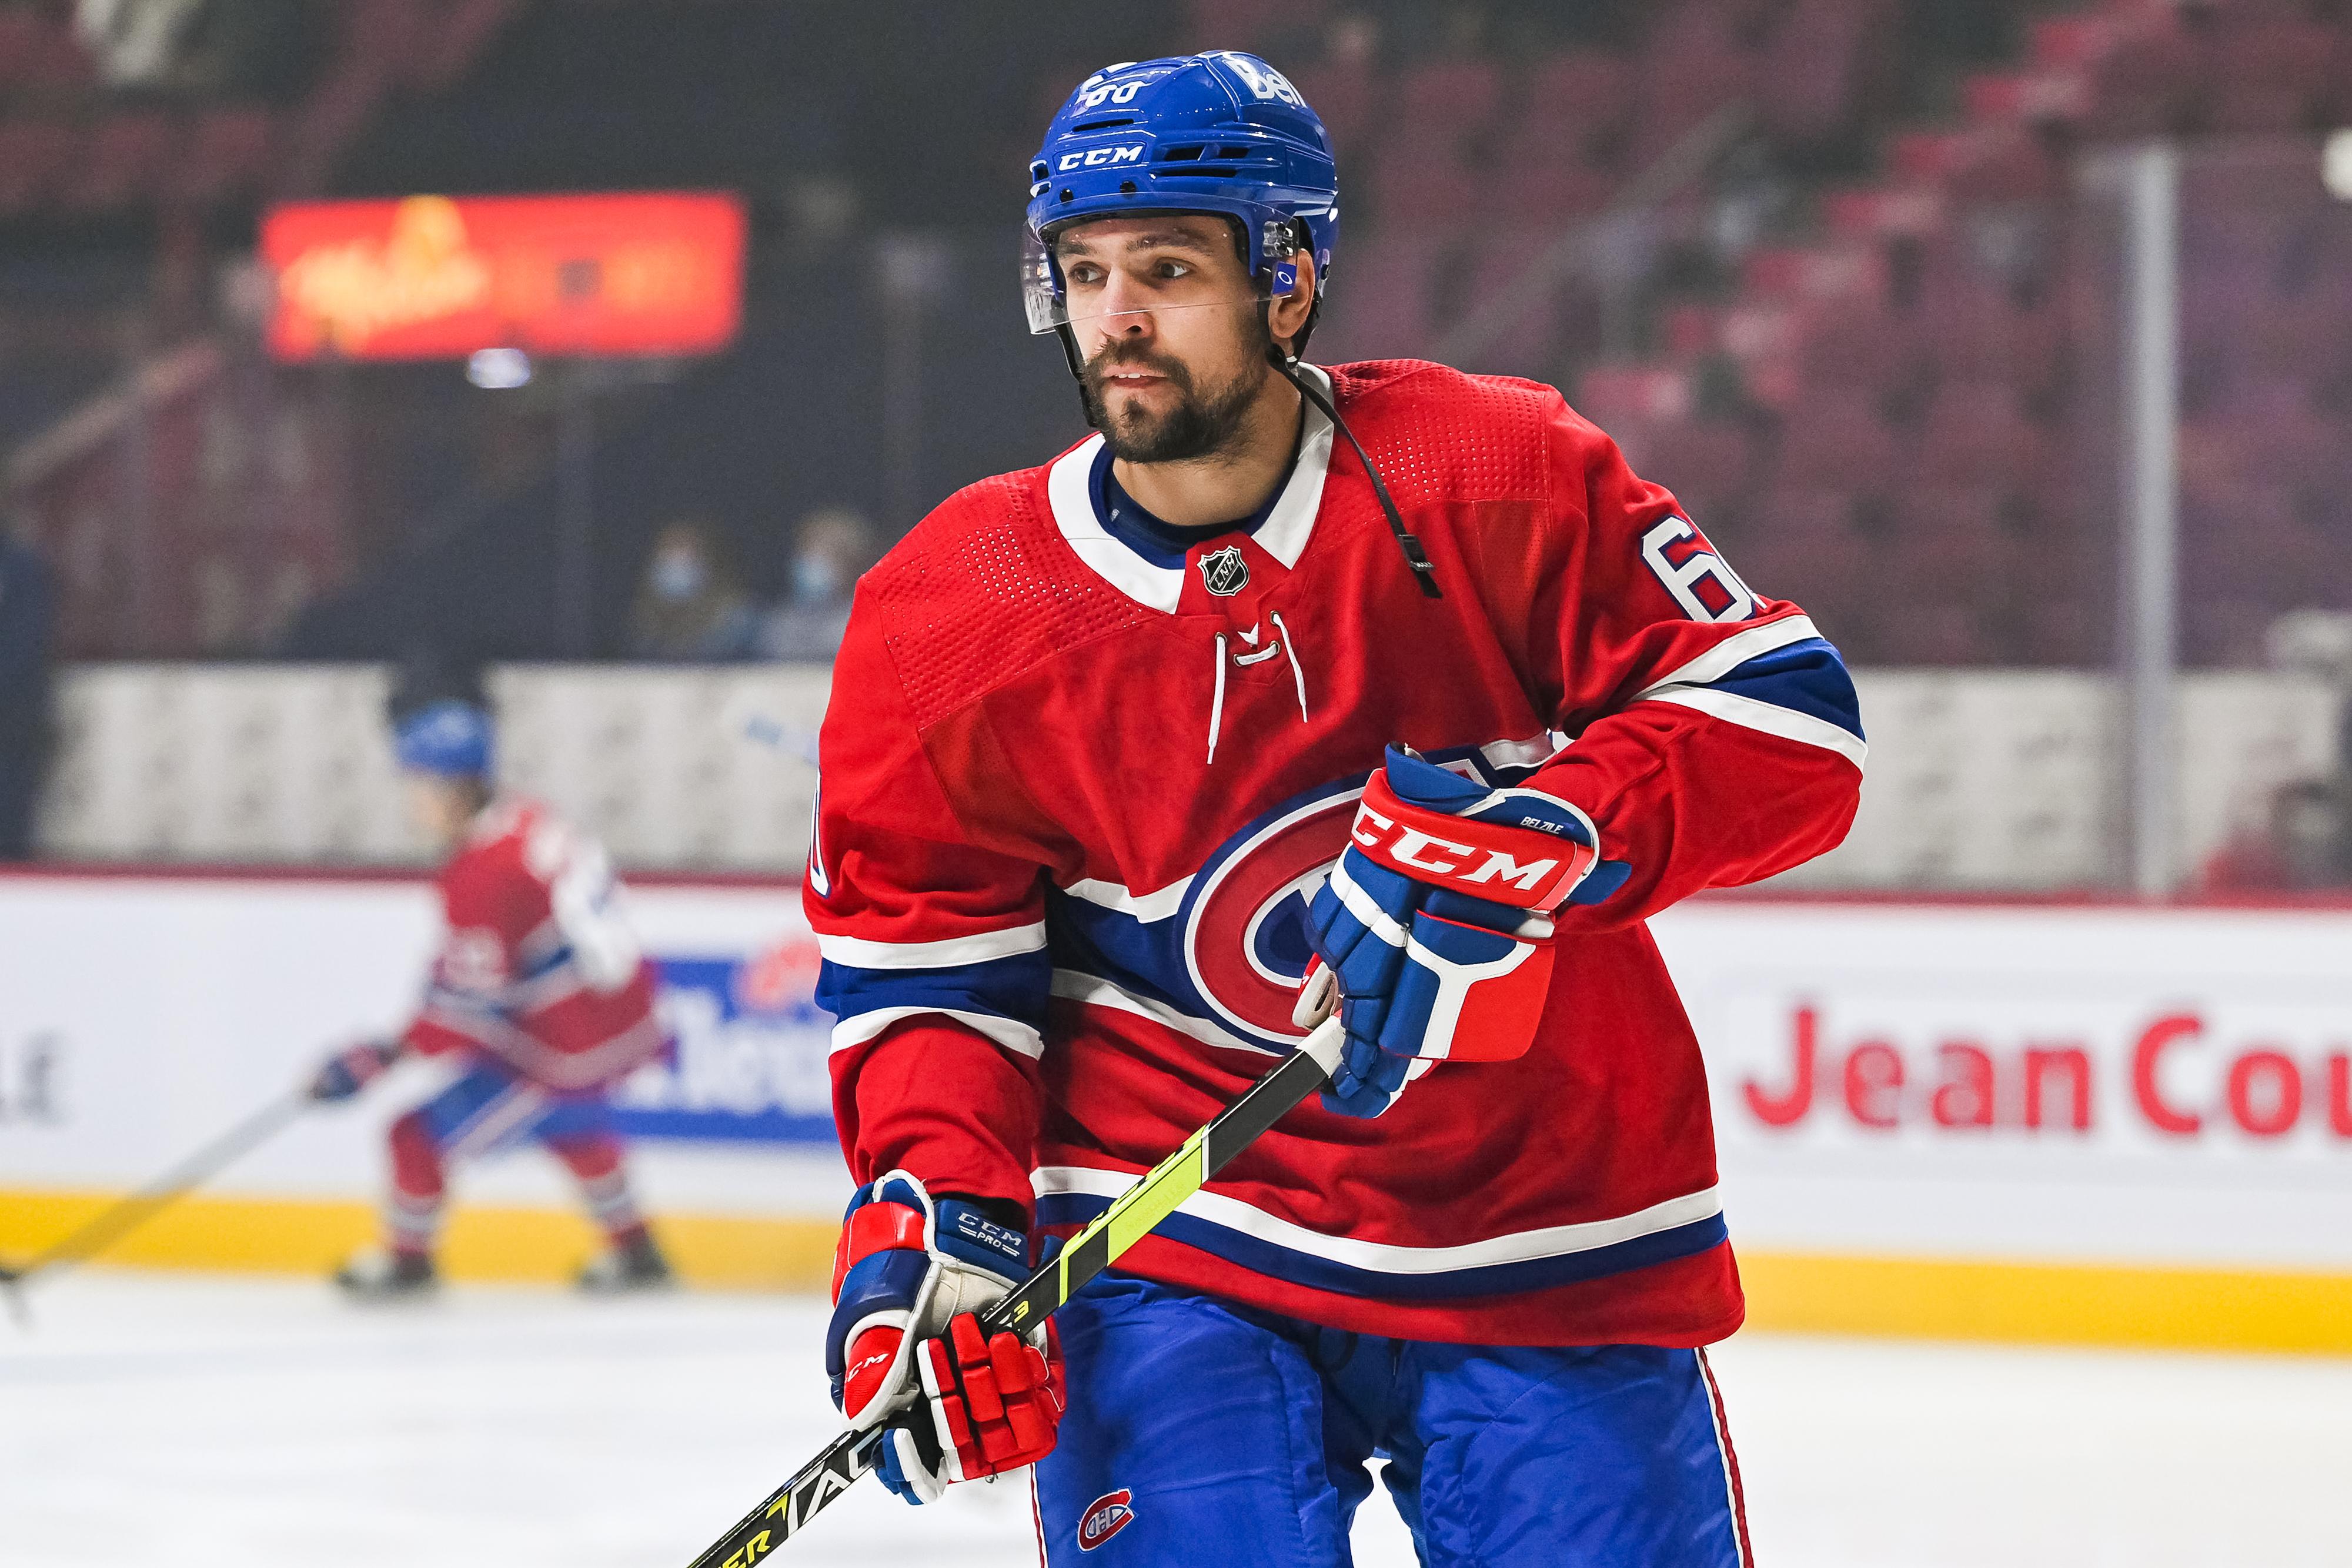 NHL: OCT 02 Preseason - Senators at Canadiens